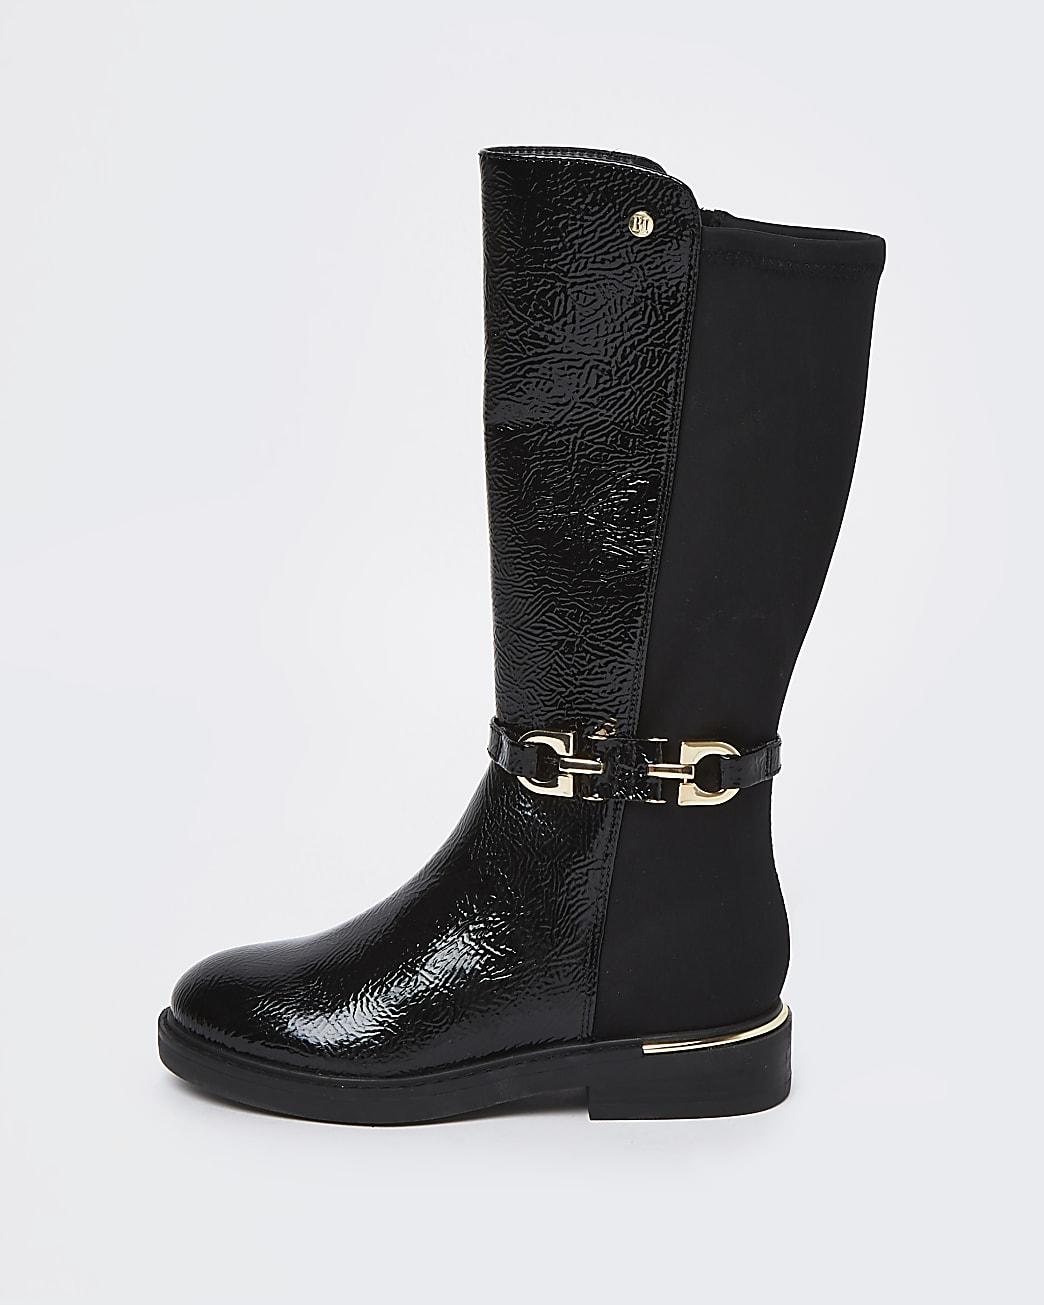 Girls black patent trim tall boot